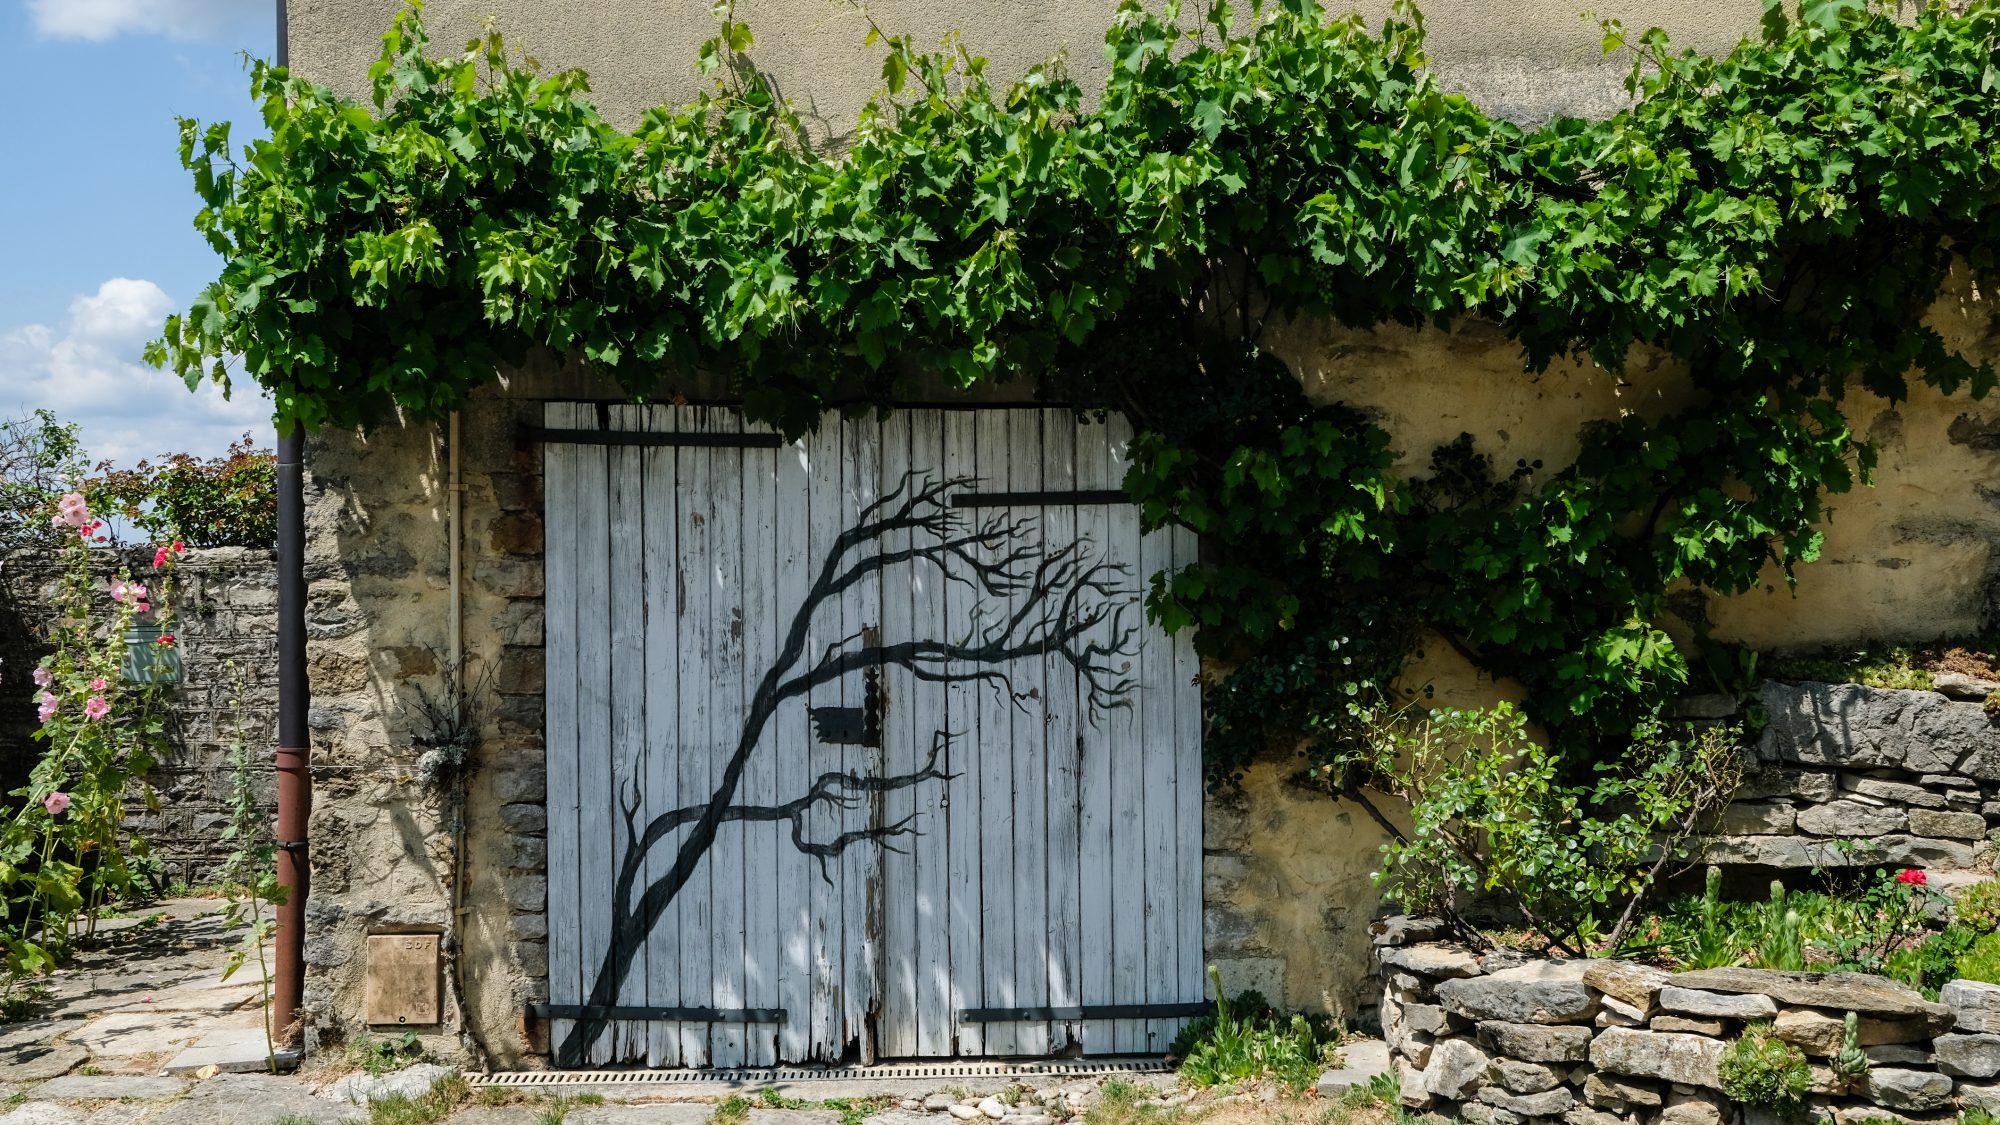 Street Art Jurasien - Chateau-Chalon, Jura